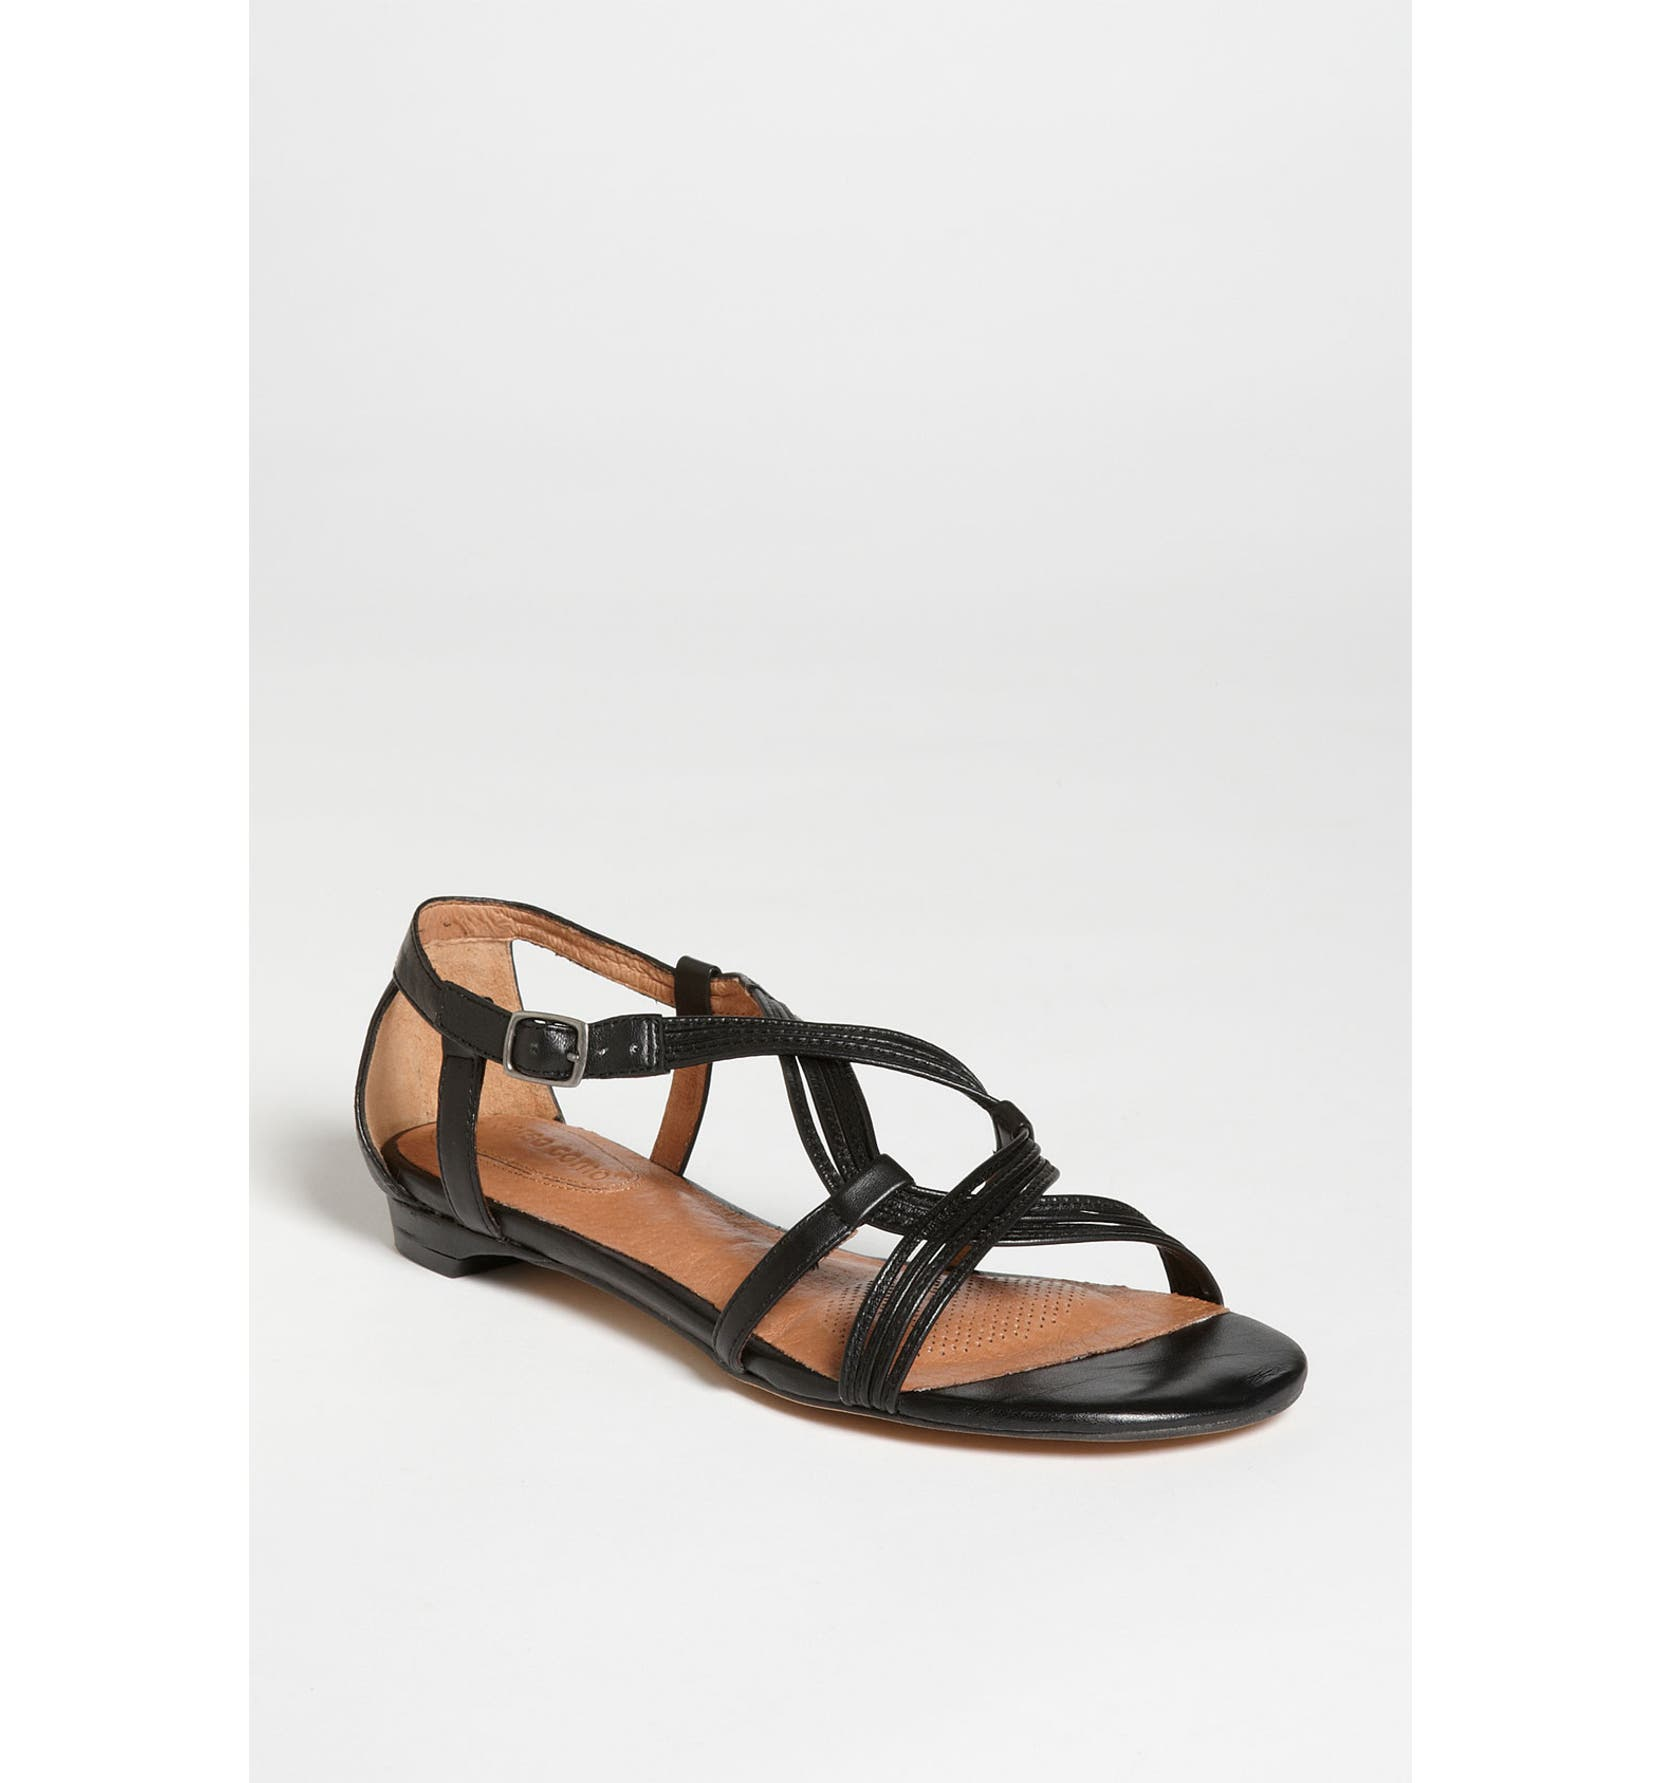 3e77087dc89ca8 Corso Como  Future  Sandal